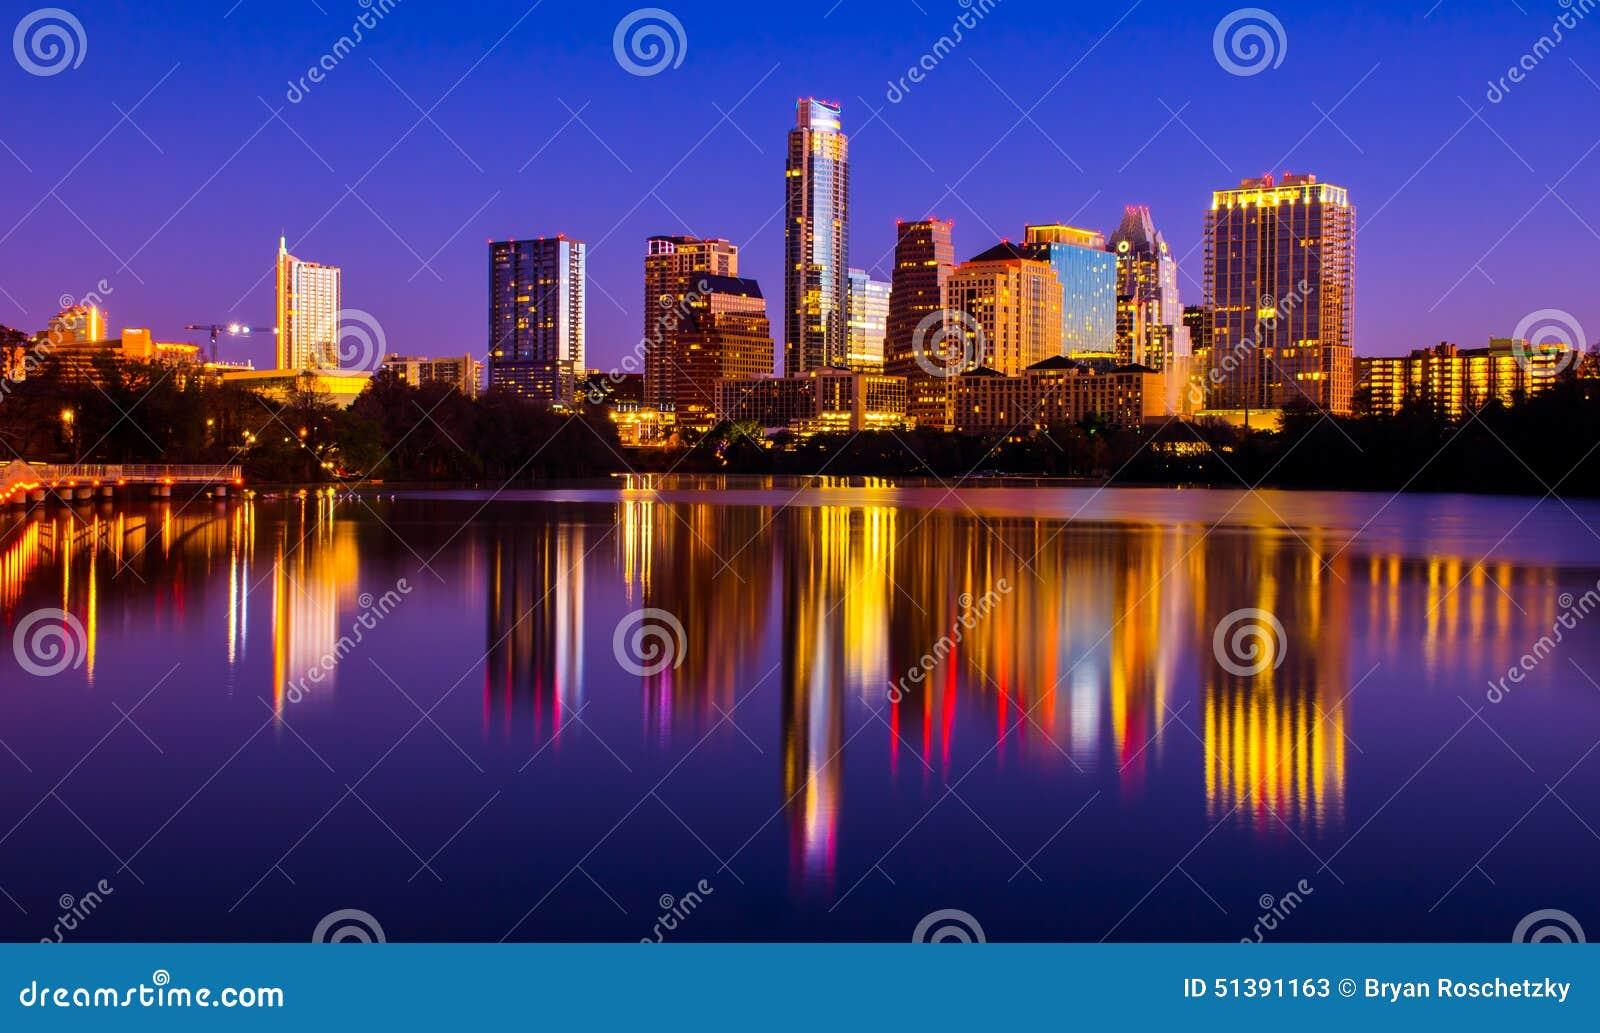 Paisaje urbano 2015 de la reflexión de espejo del puente peatonal de la orilla de Austin Texas Skyline